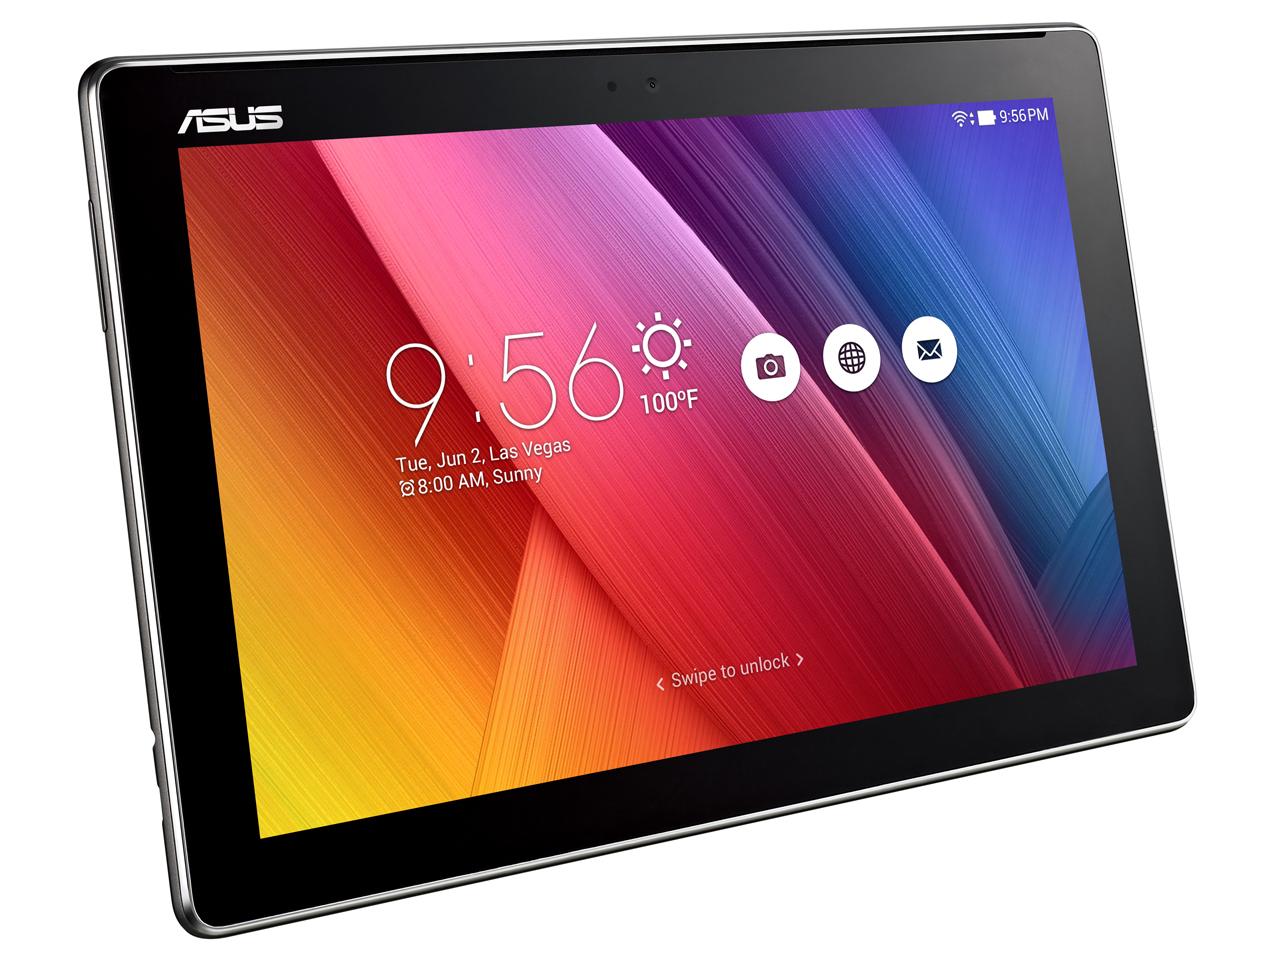 ASUSから「ZenPad 10 Z300M」が登場!スペックや価格・発売日情報